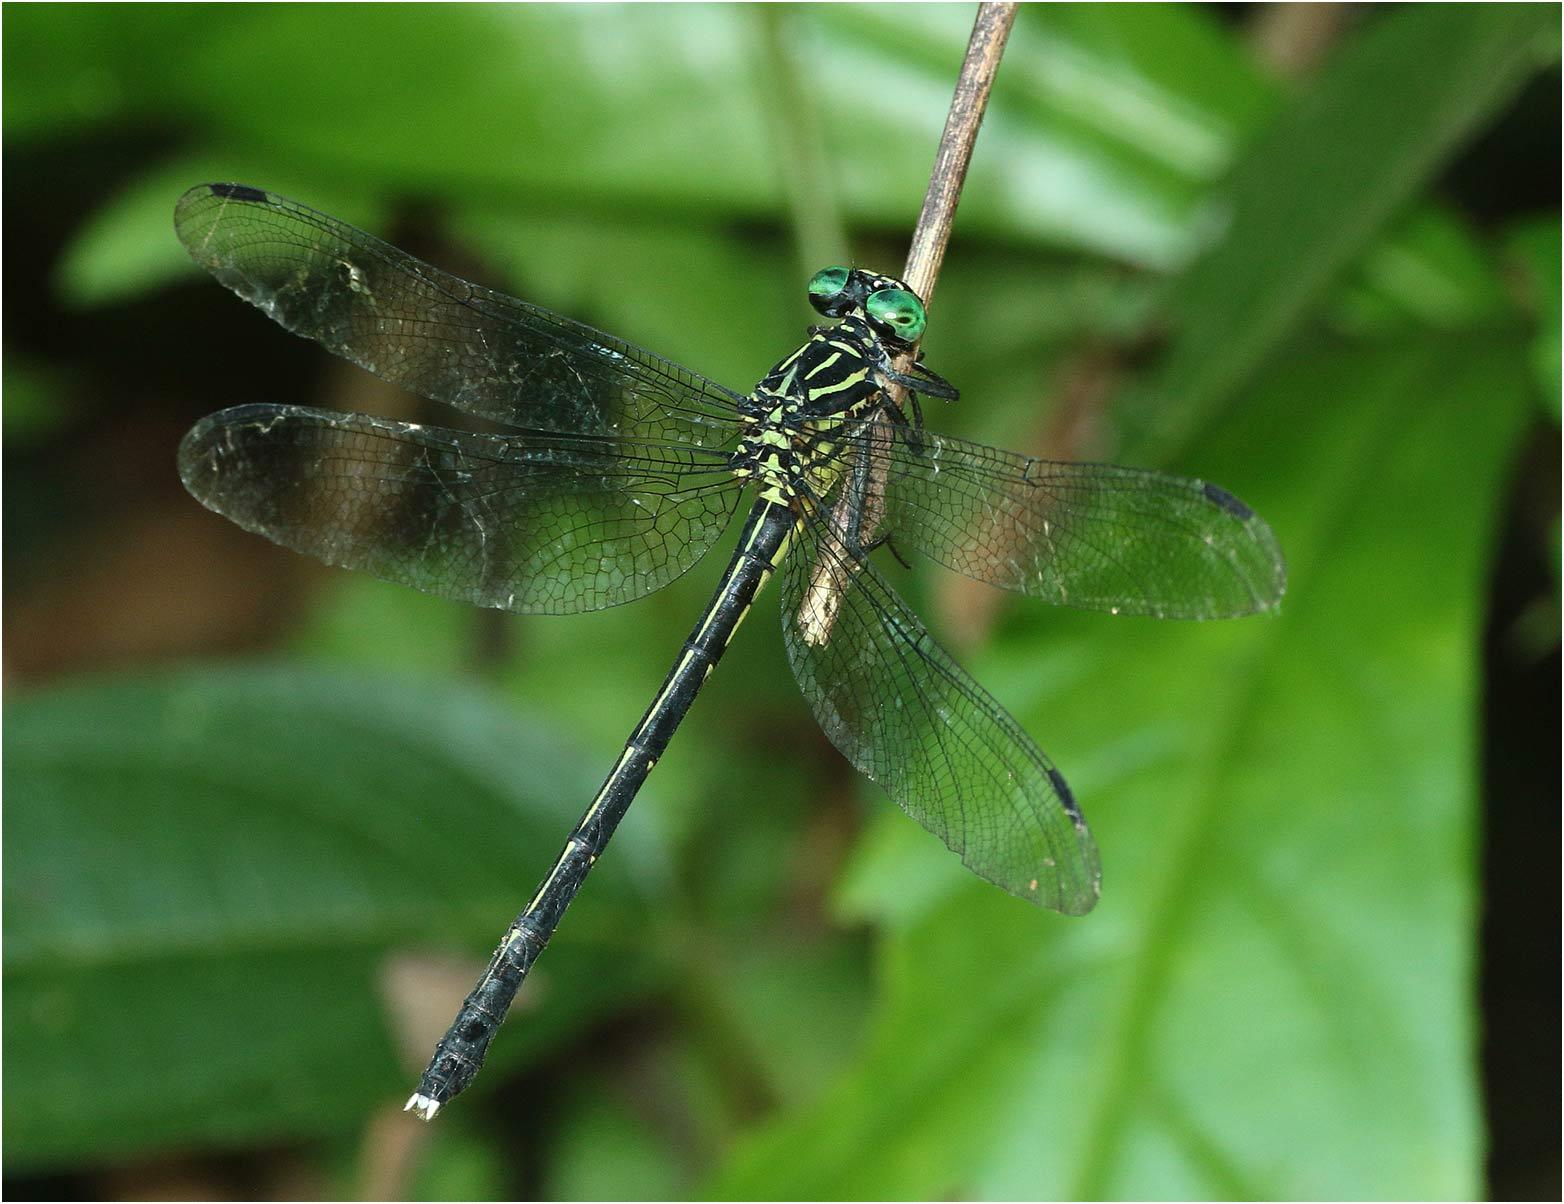 Leptogomphus divaricatus femelle, Vietnam, Xuan Son, 08/06/2018